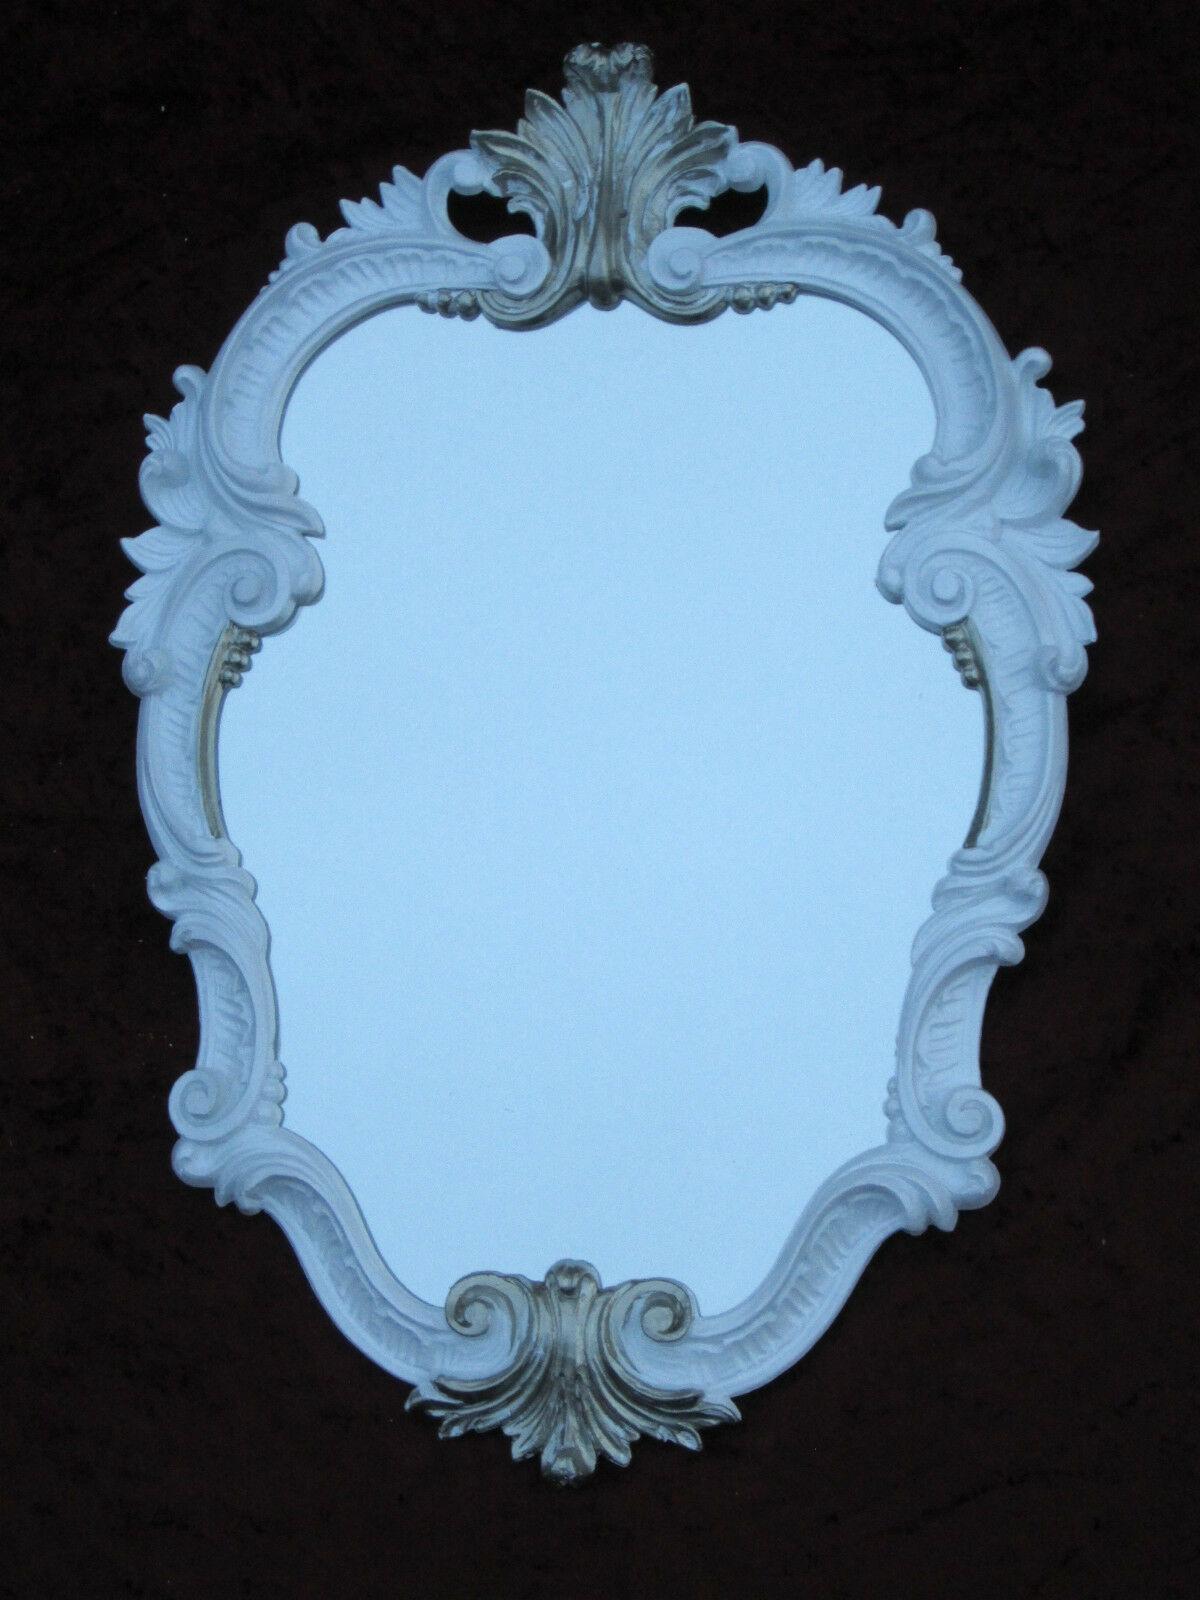 Wandspiegel Weiss Silber Antik Oval Vintage Badspiegel Barock 49x33